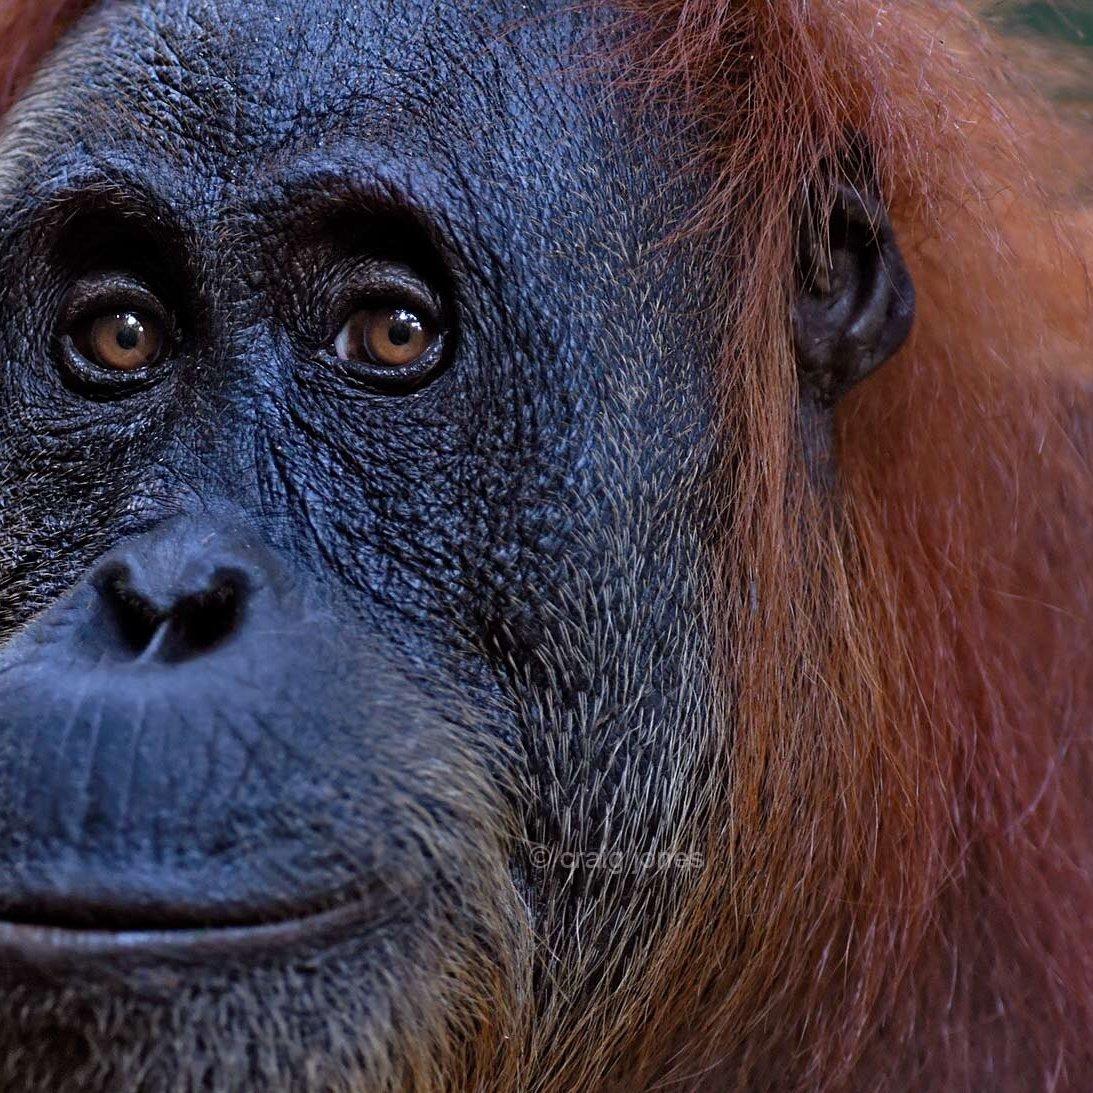 Sumatran orangutan close up. Craig Jones Wildlife Photography